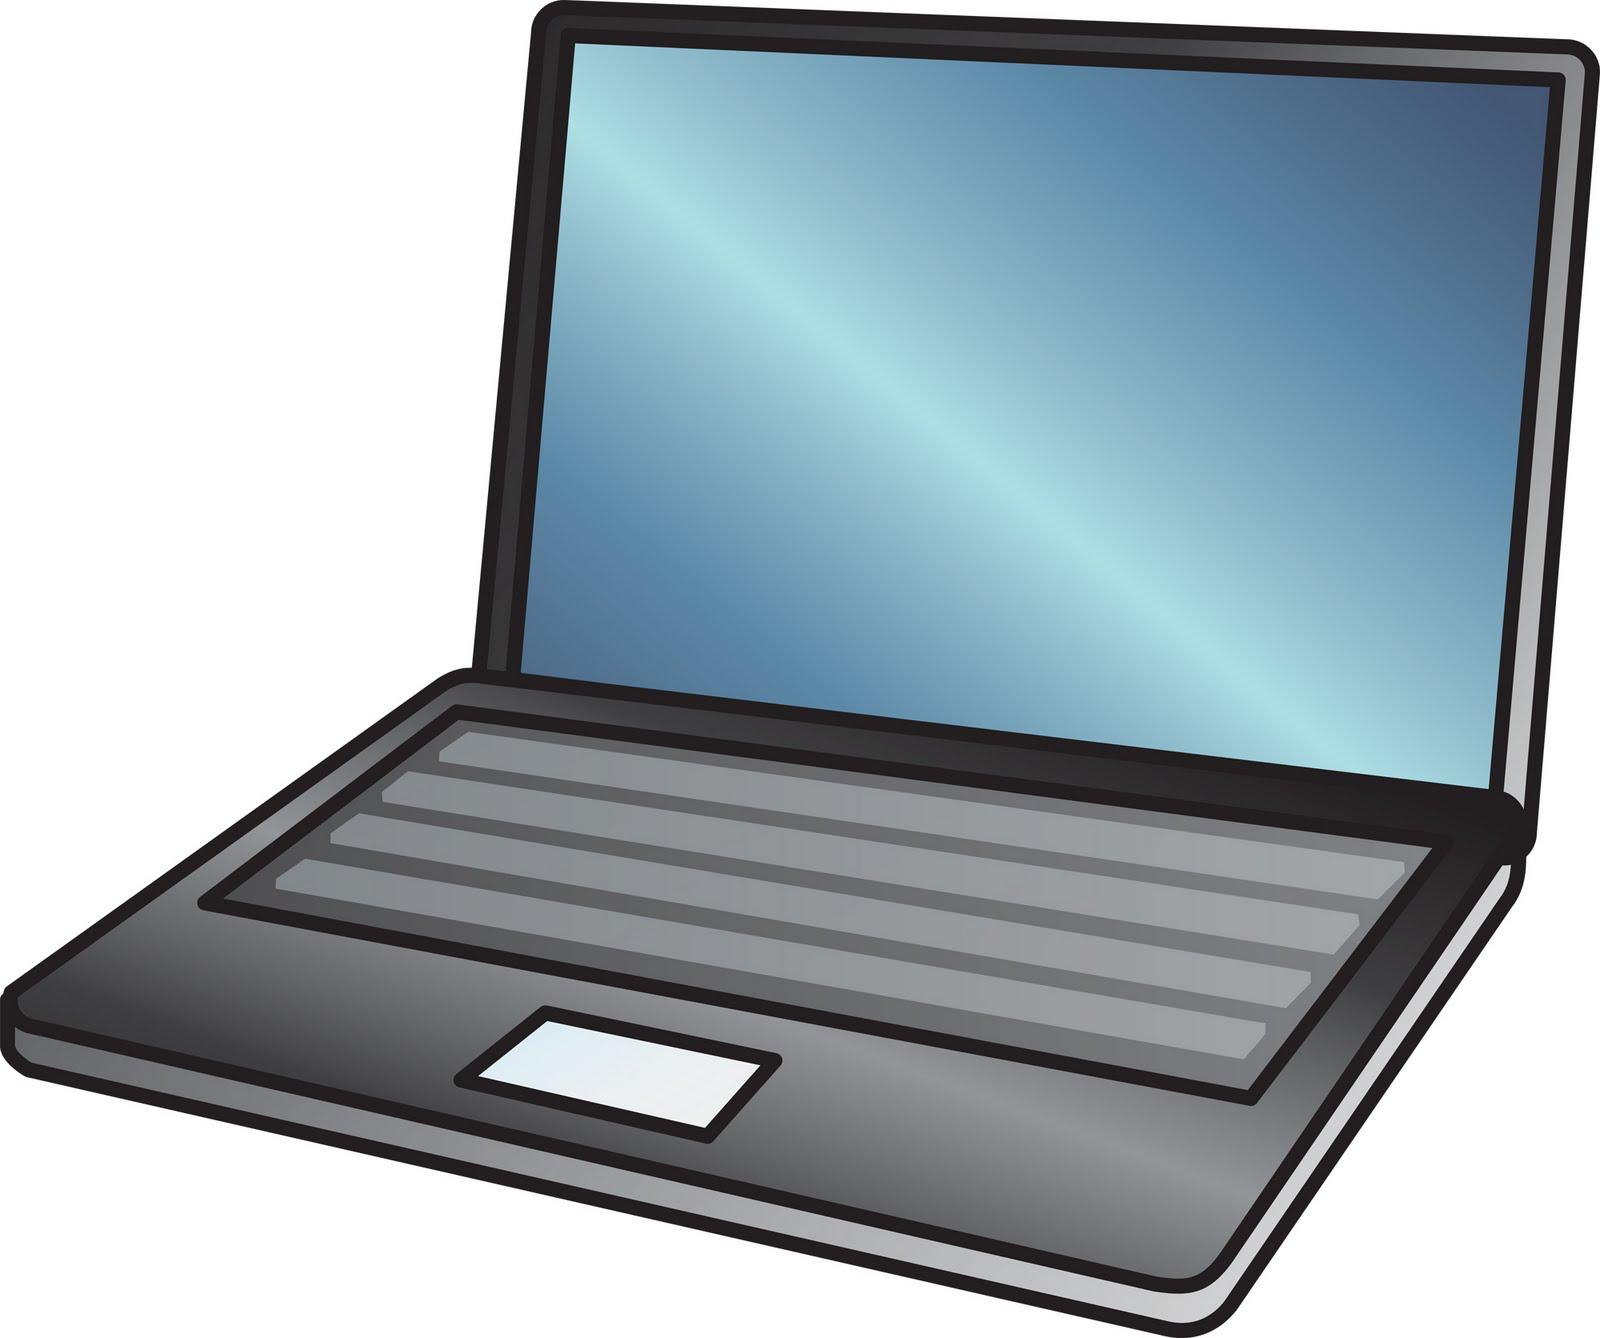 Computer clip art images free clipart